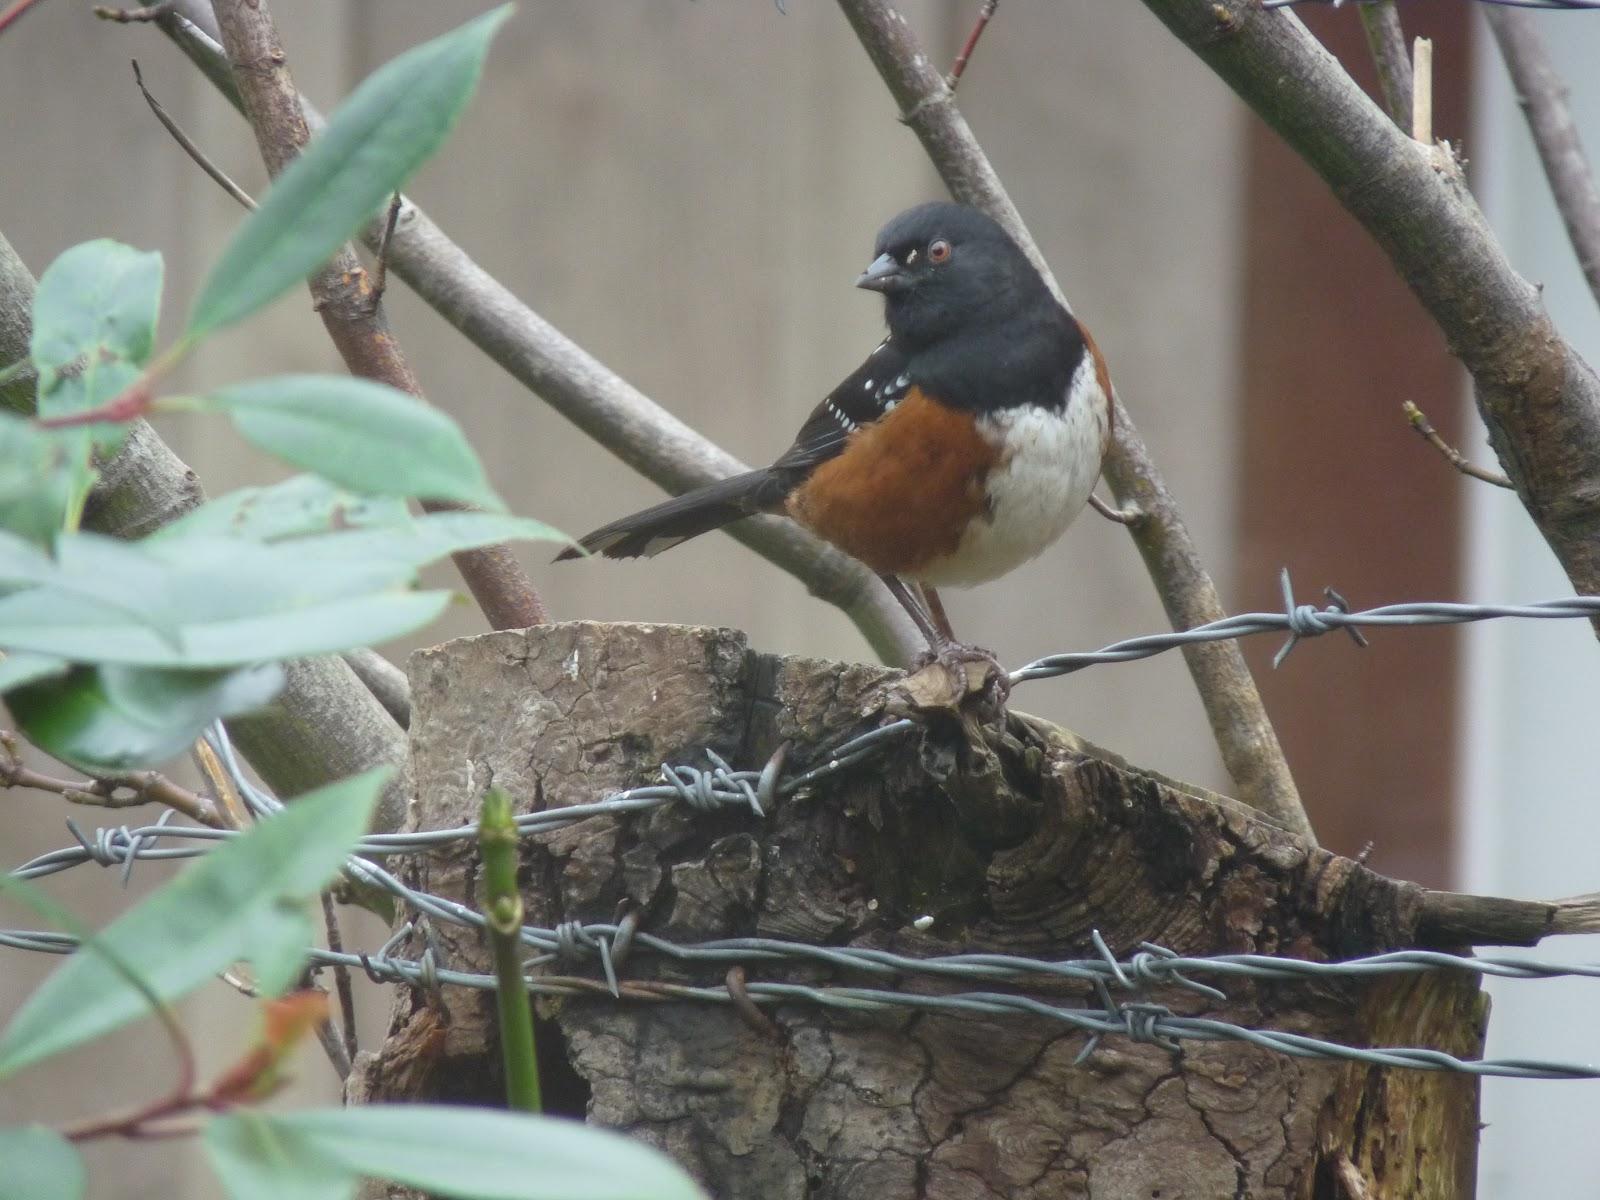 Gabriola Bird Blog: Great Backyard Bird Count!